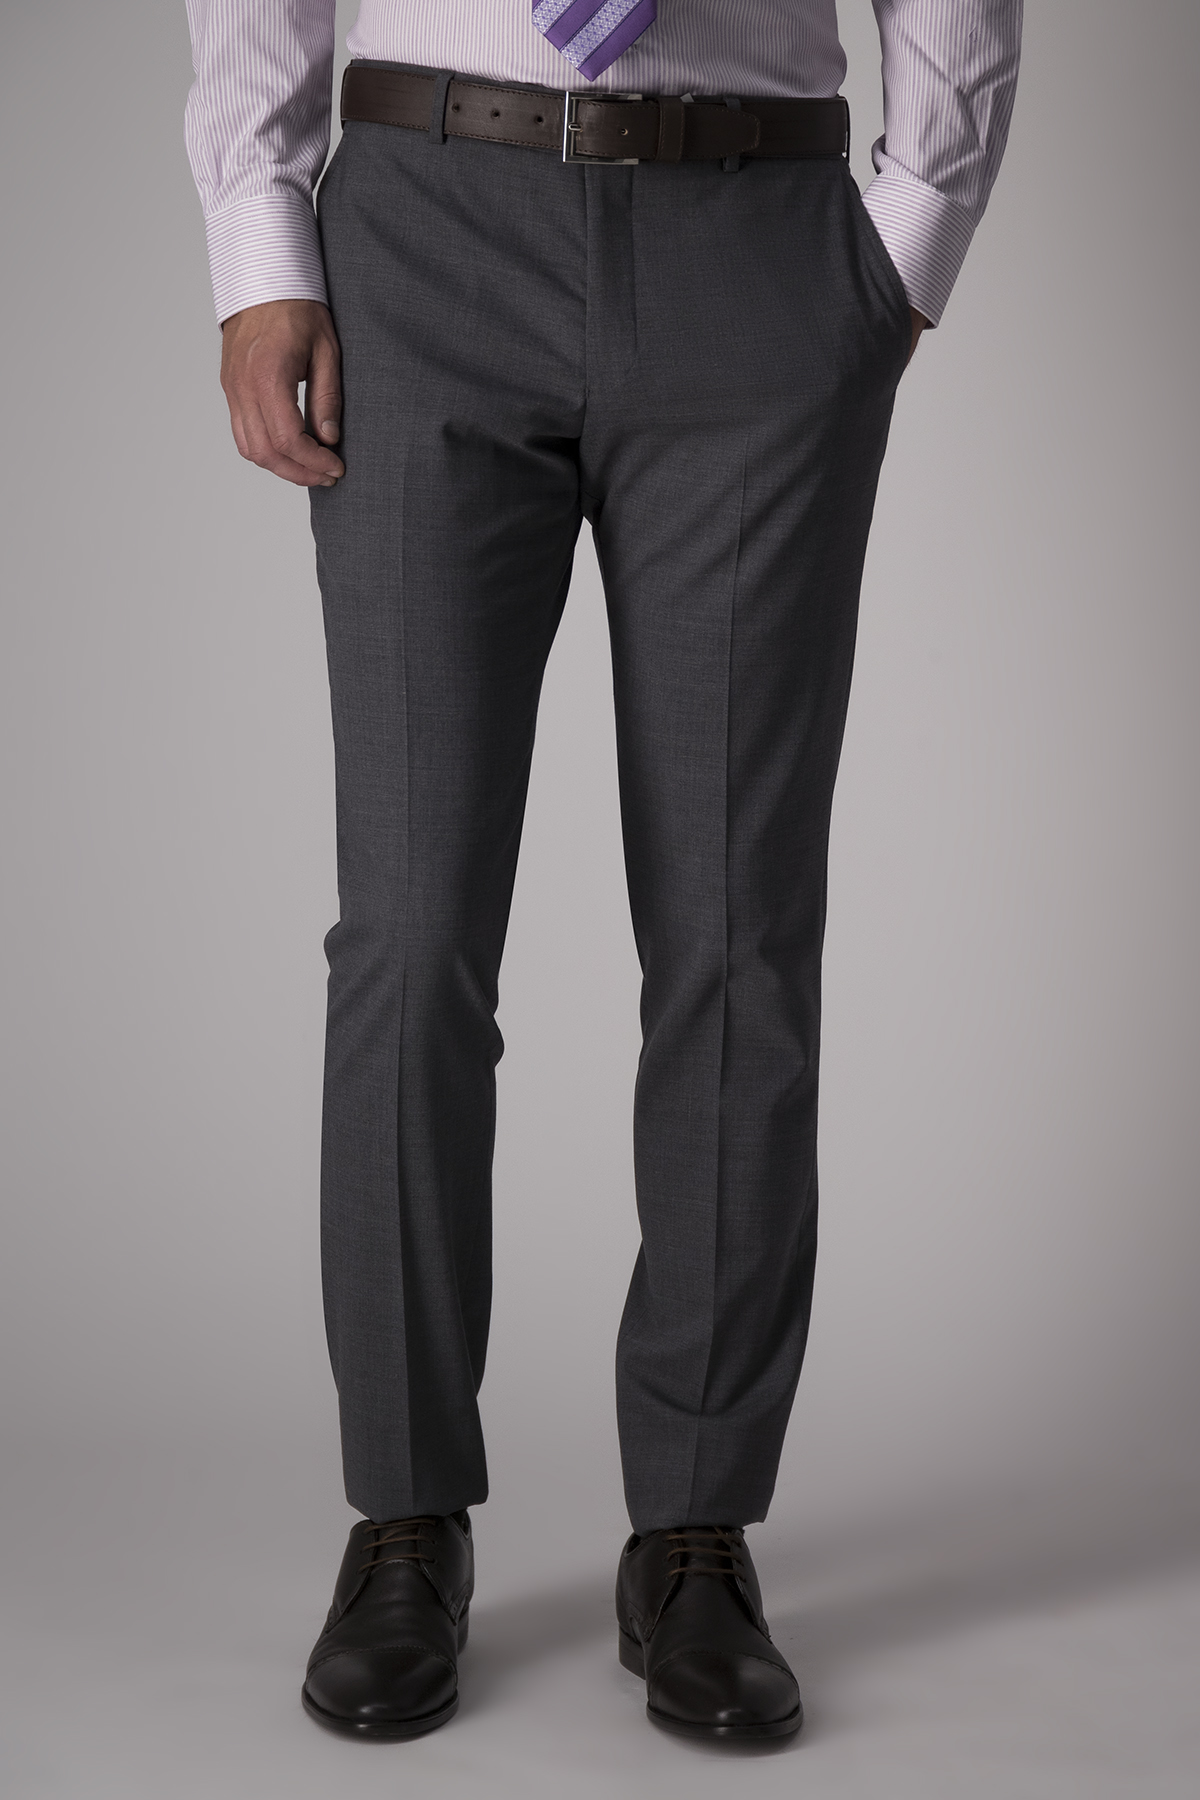 Traje Robert´s Red, slim fit, gris oxford, lana stretch